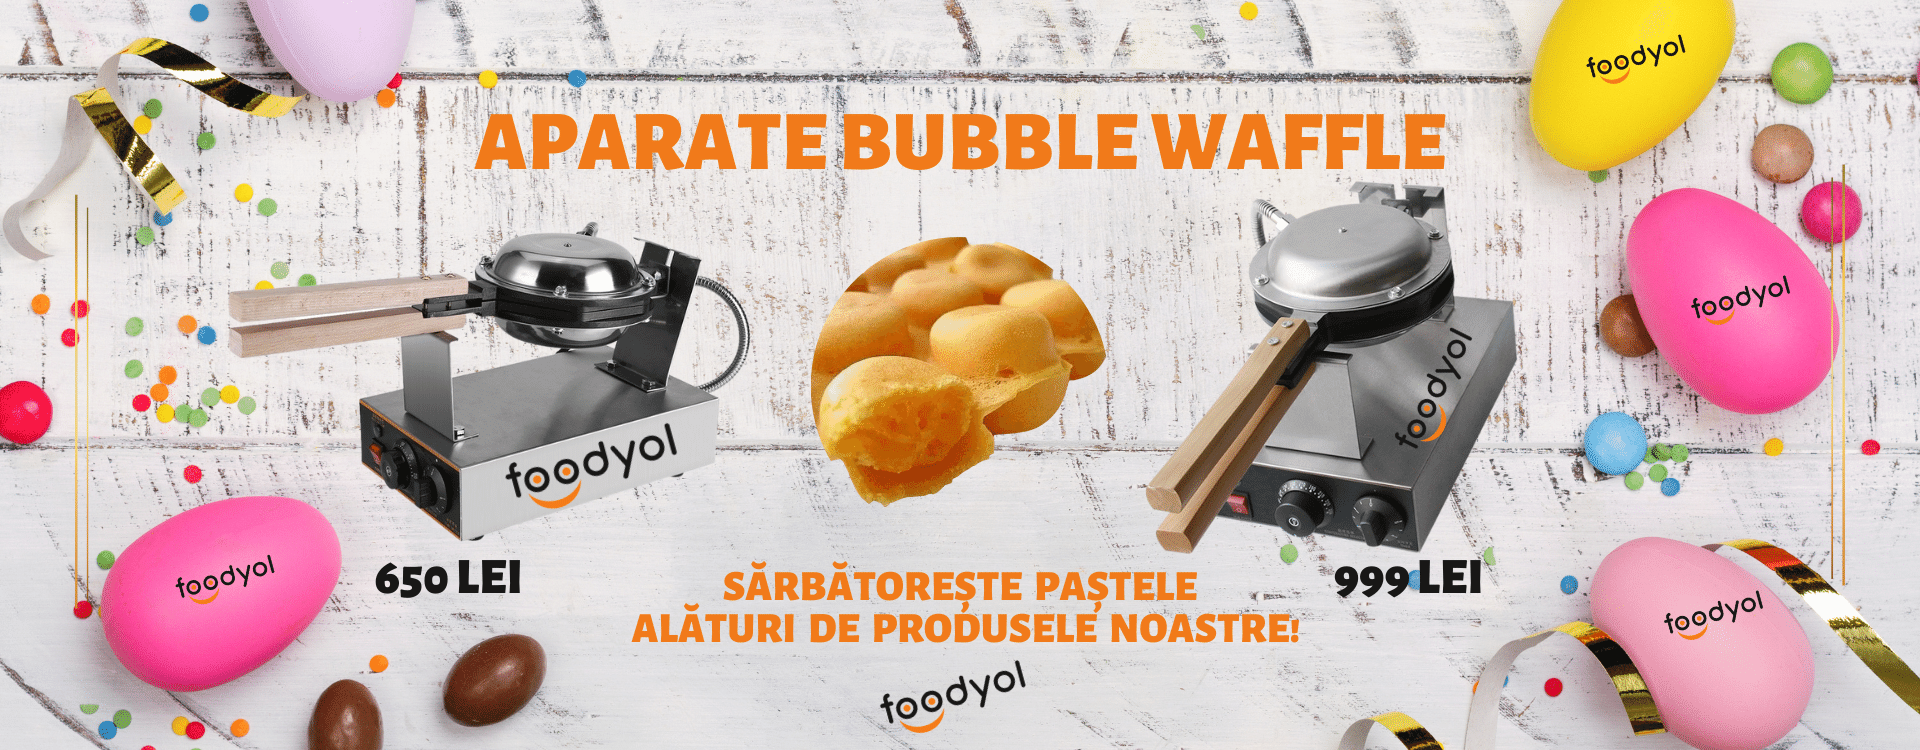 Aparate bubble waffle